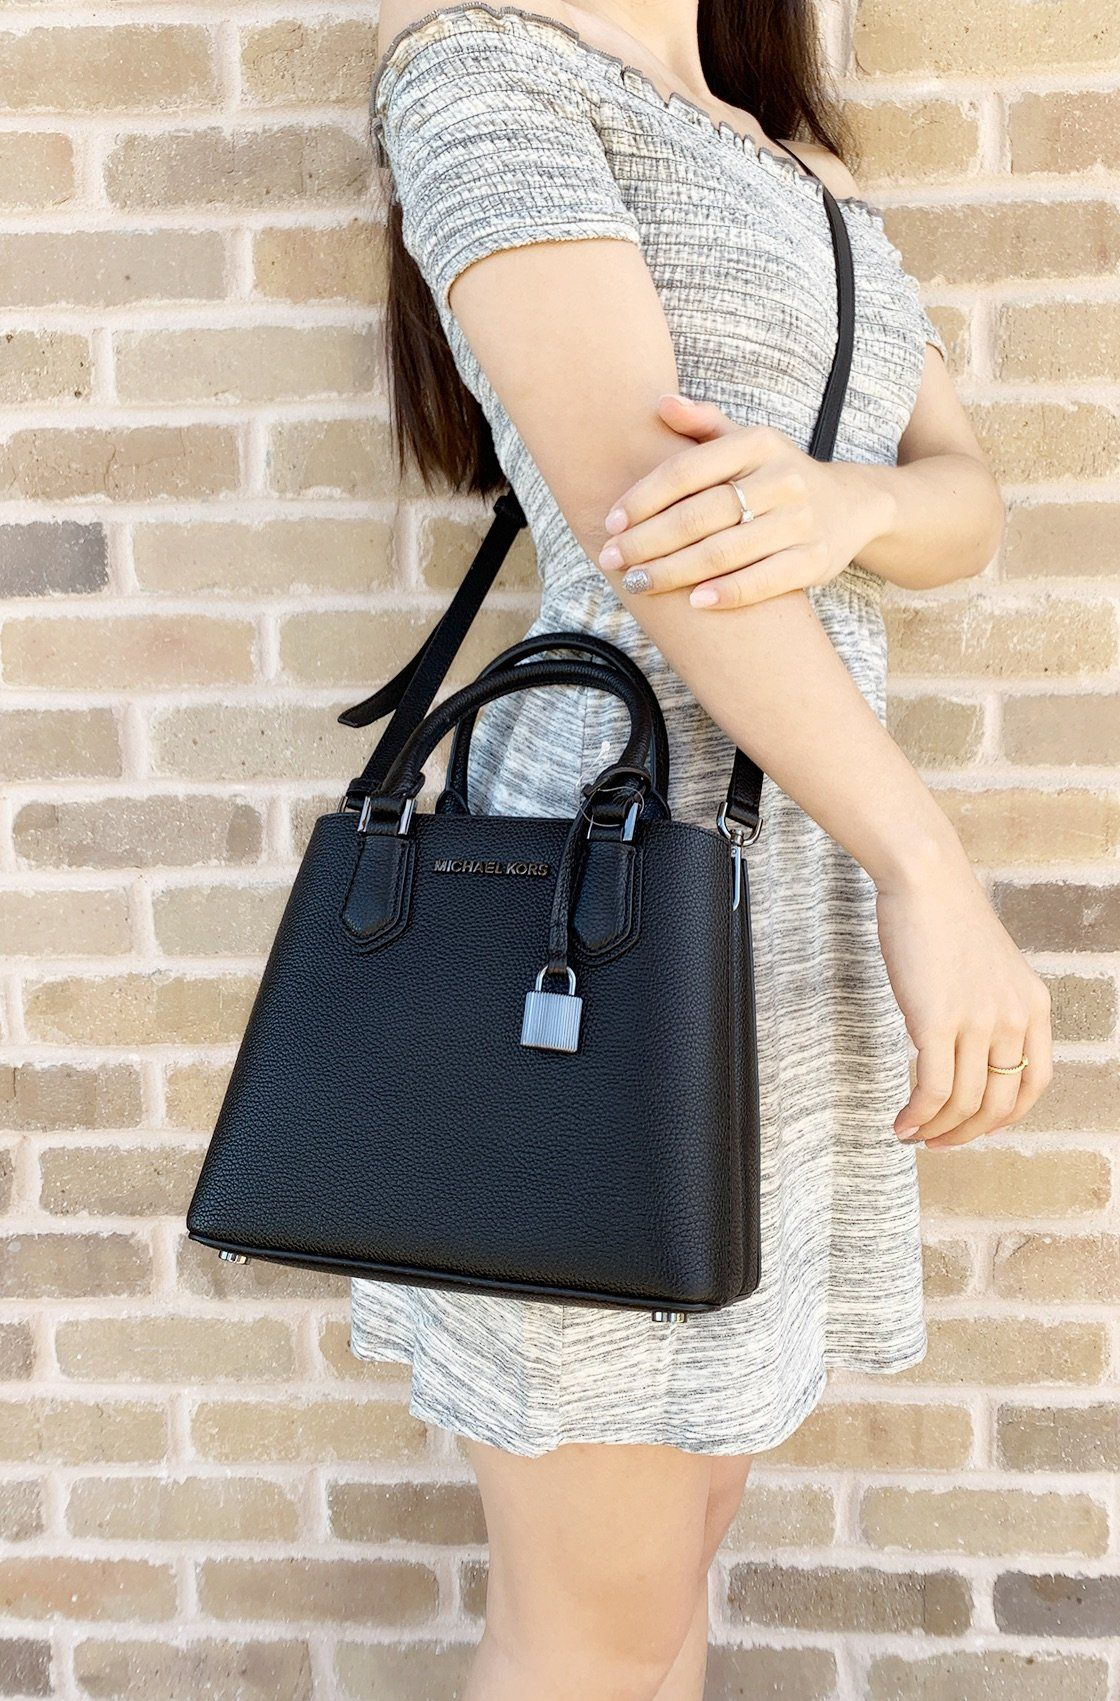 fbba05224210 Michael Kors Adele Mercer Medium Messenger Bag Black Gunmetal #ebayreseller  #MichaelKors #poshcloset #mercaricode #Handbags #poshfind #ebayresellers ...